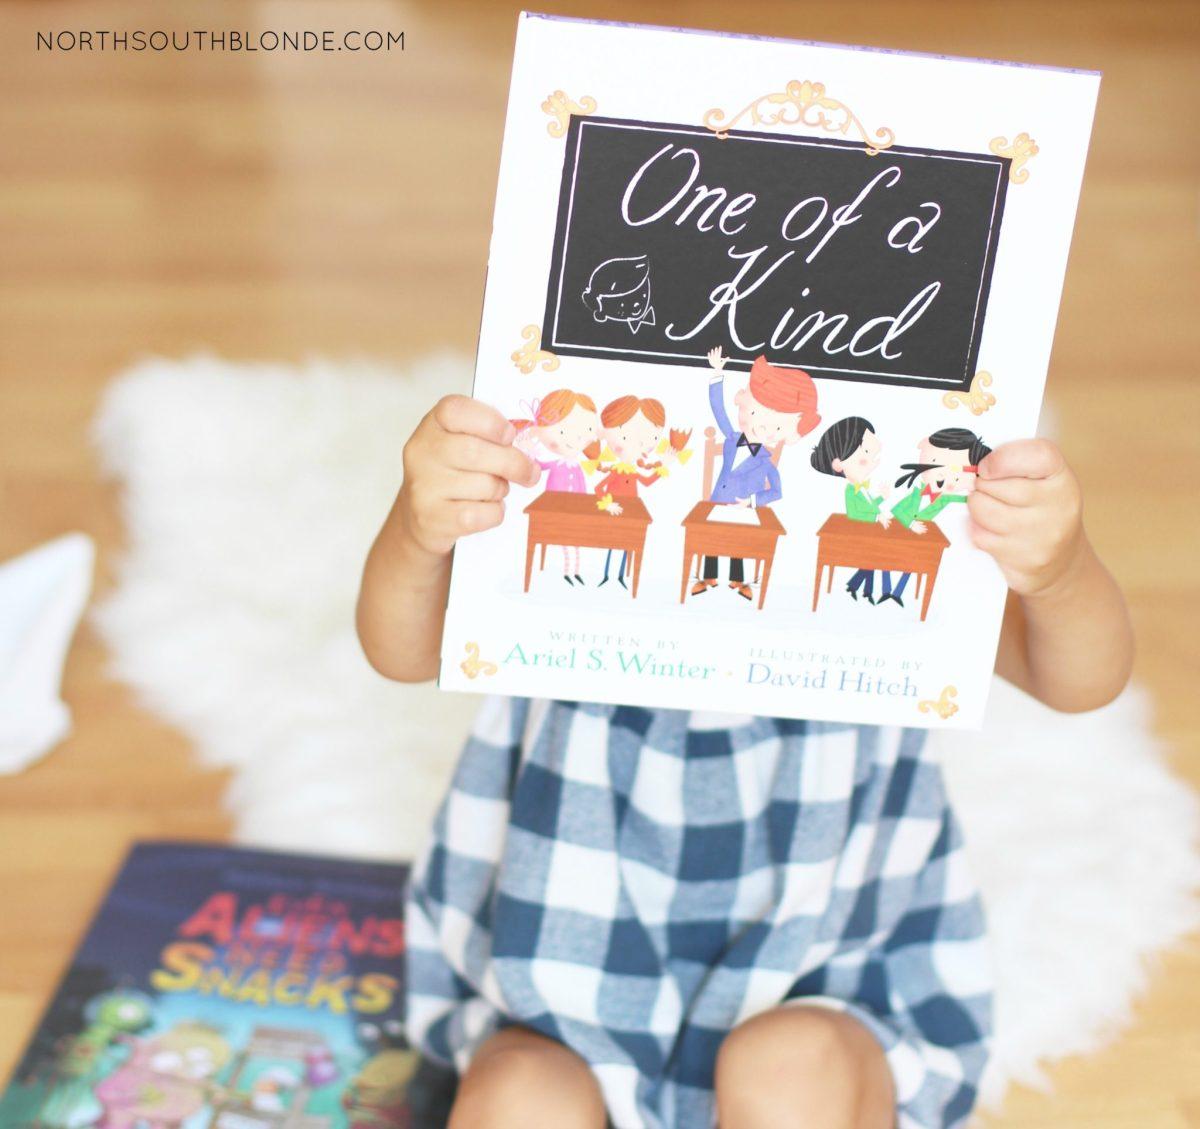 Bookroo - Children's Books (Unboxing)